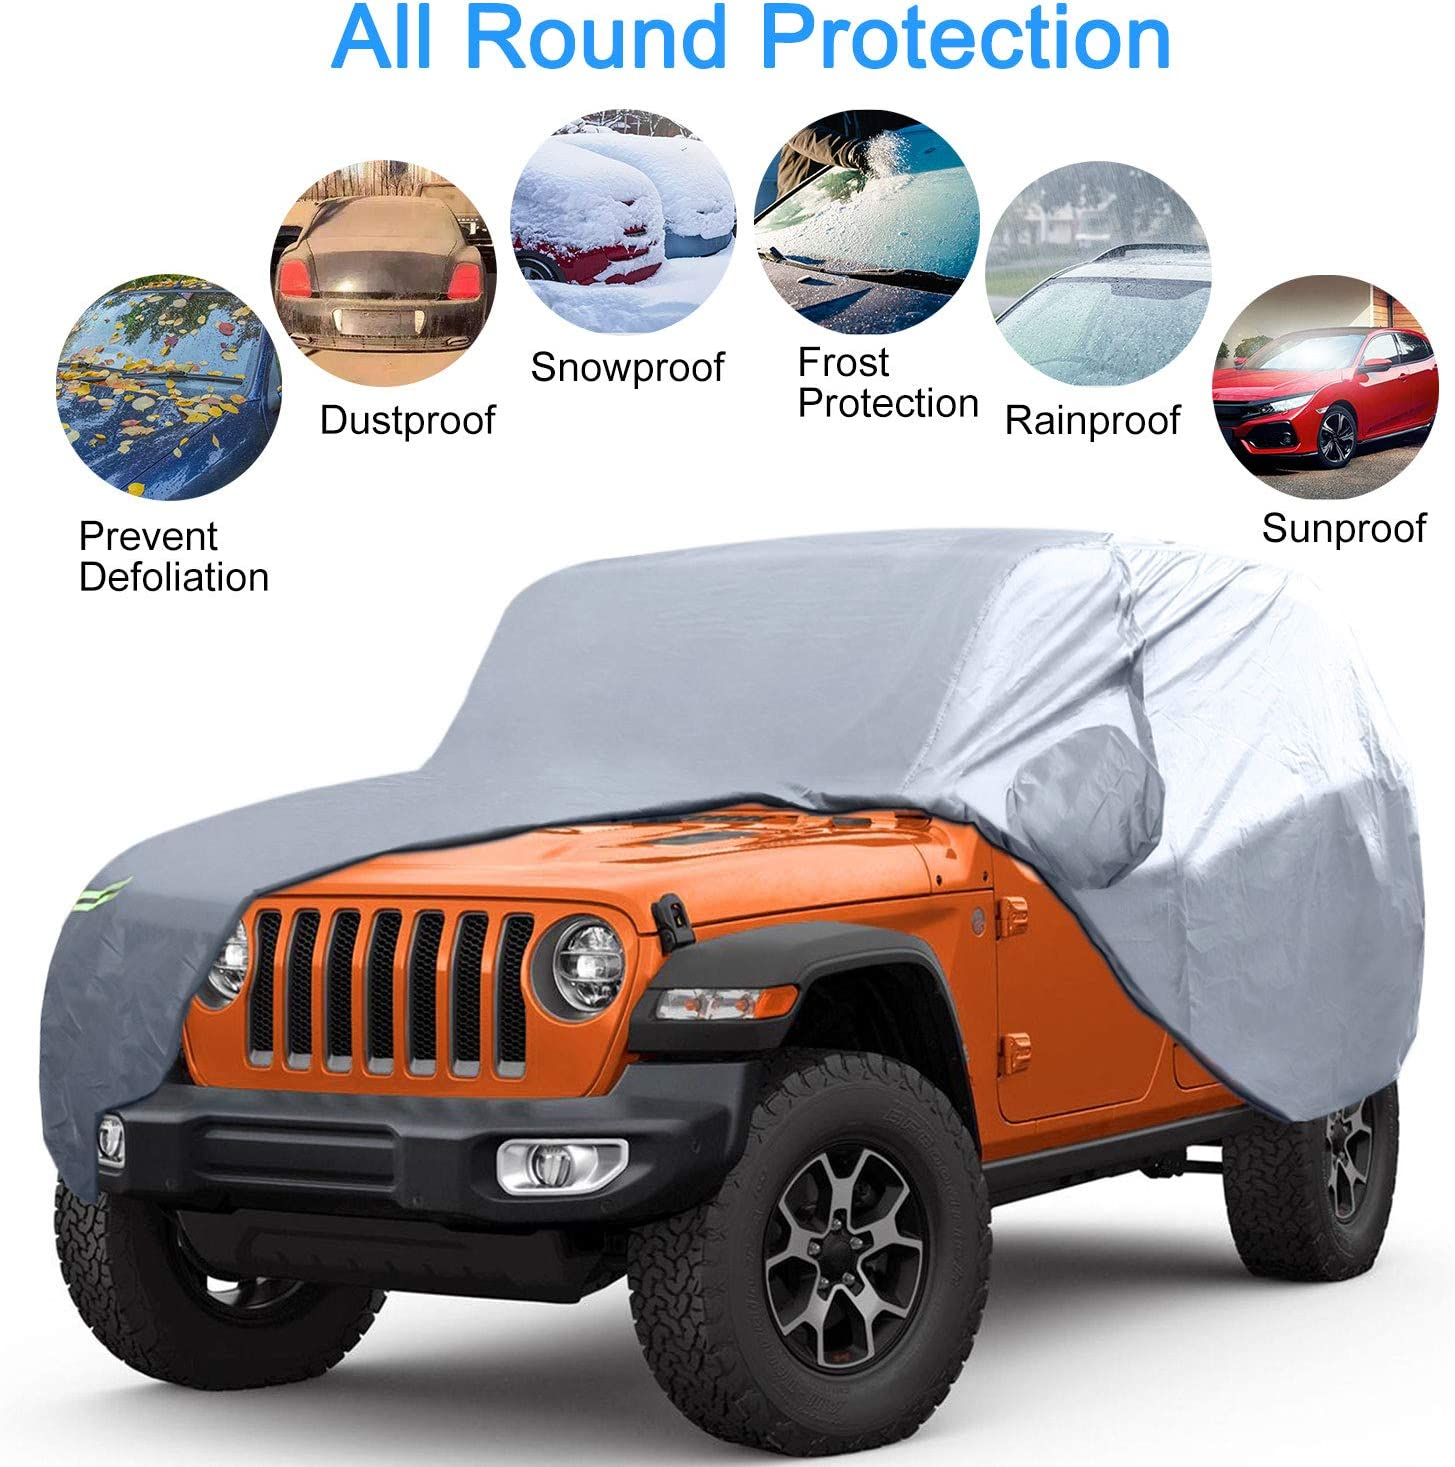 KAKIT 210D Oxford Rain Cover for Jeep Wrangler 4 Door Fit CJ,YJ TJ /& JK 2007-2020 Driver Door Zipper Anti-Theft Lock Included